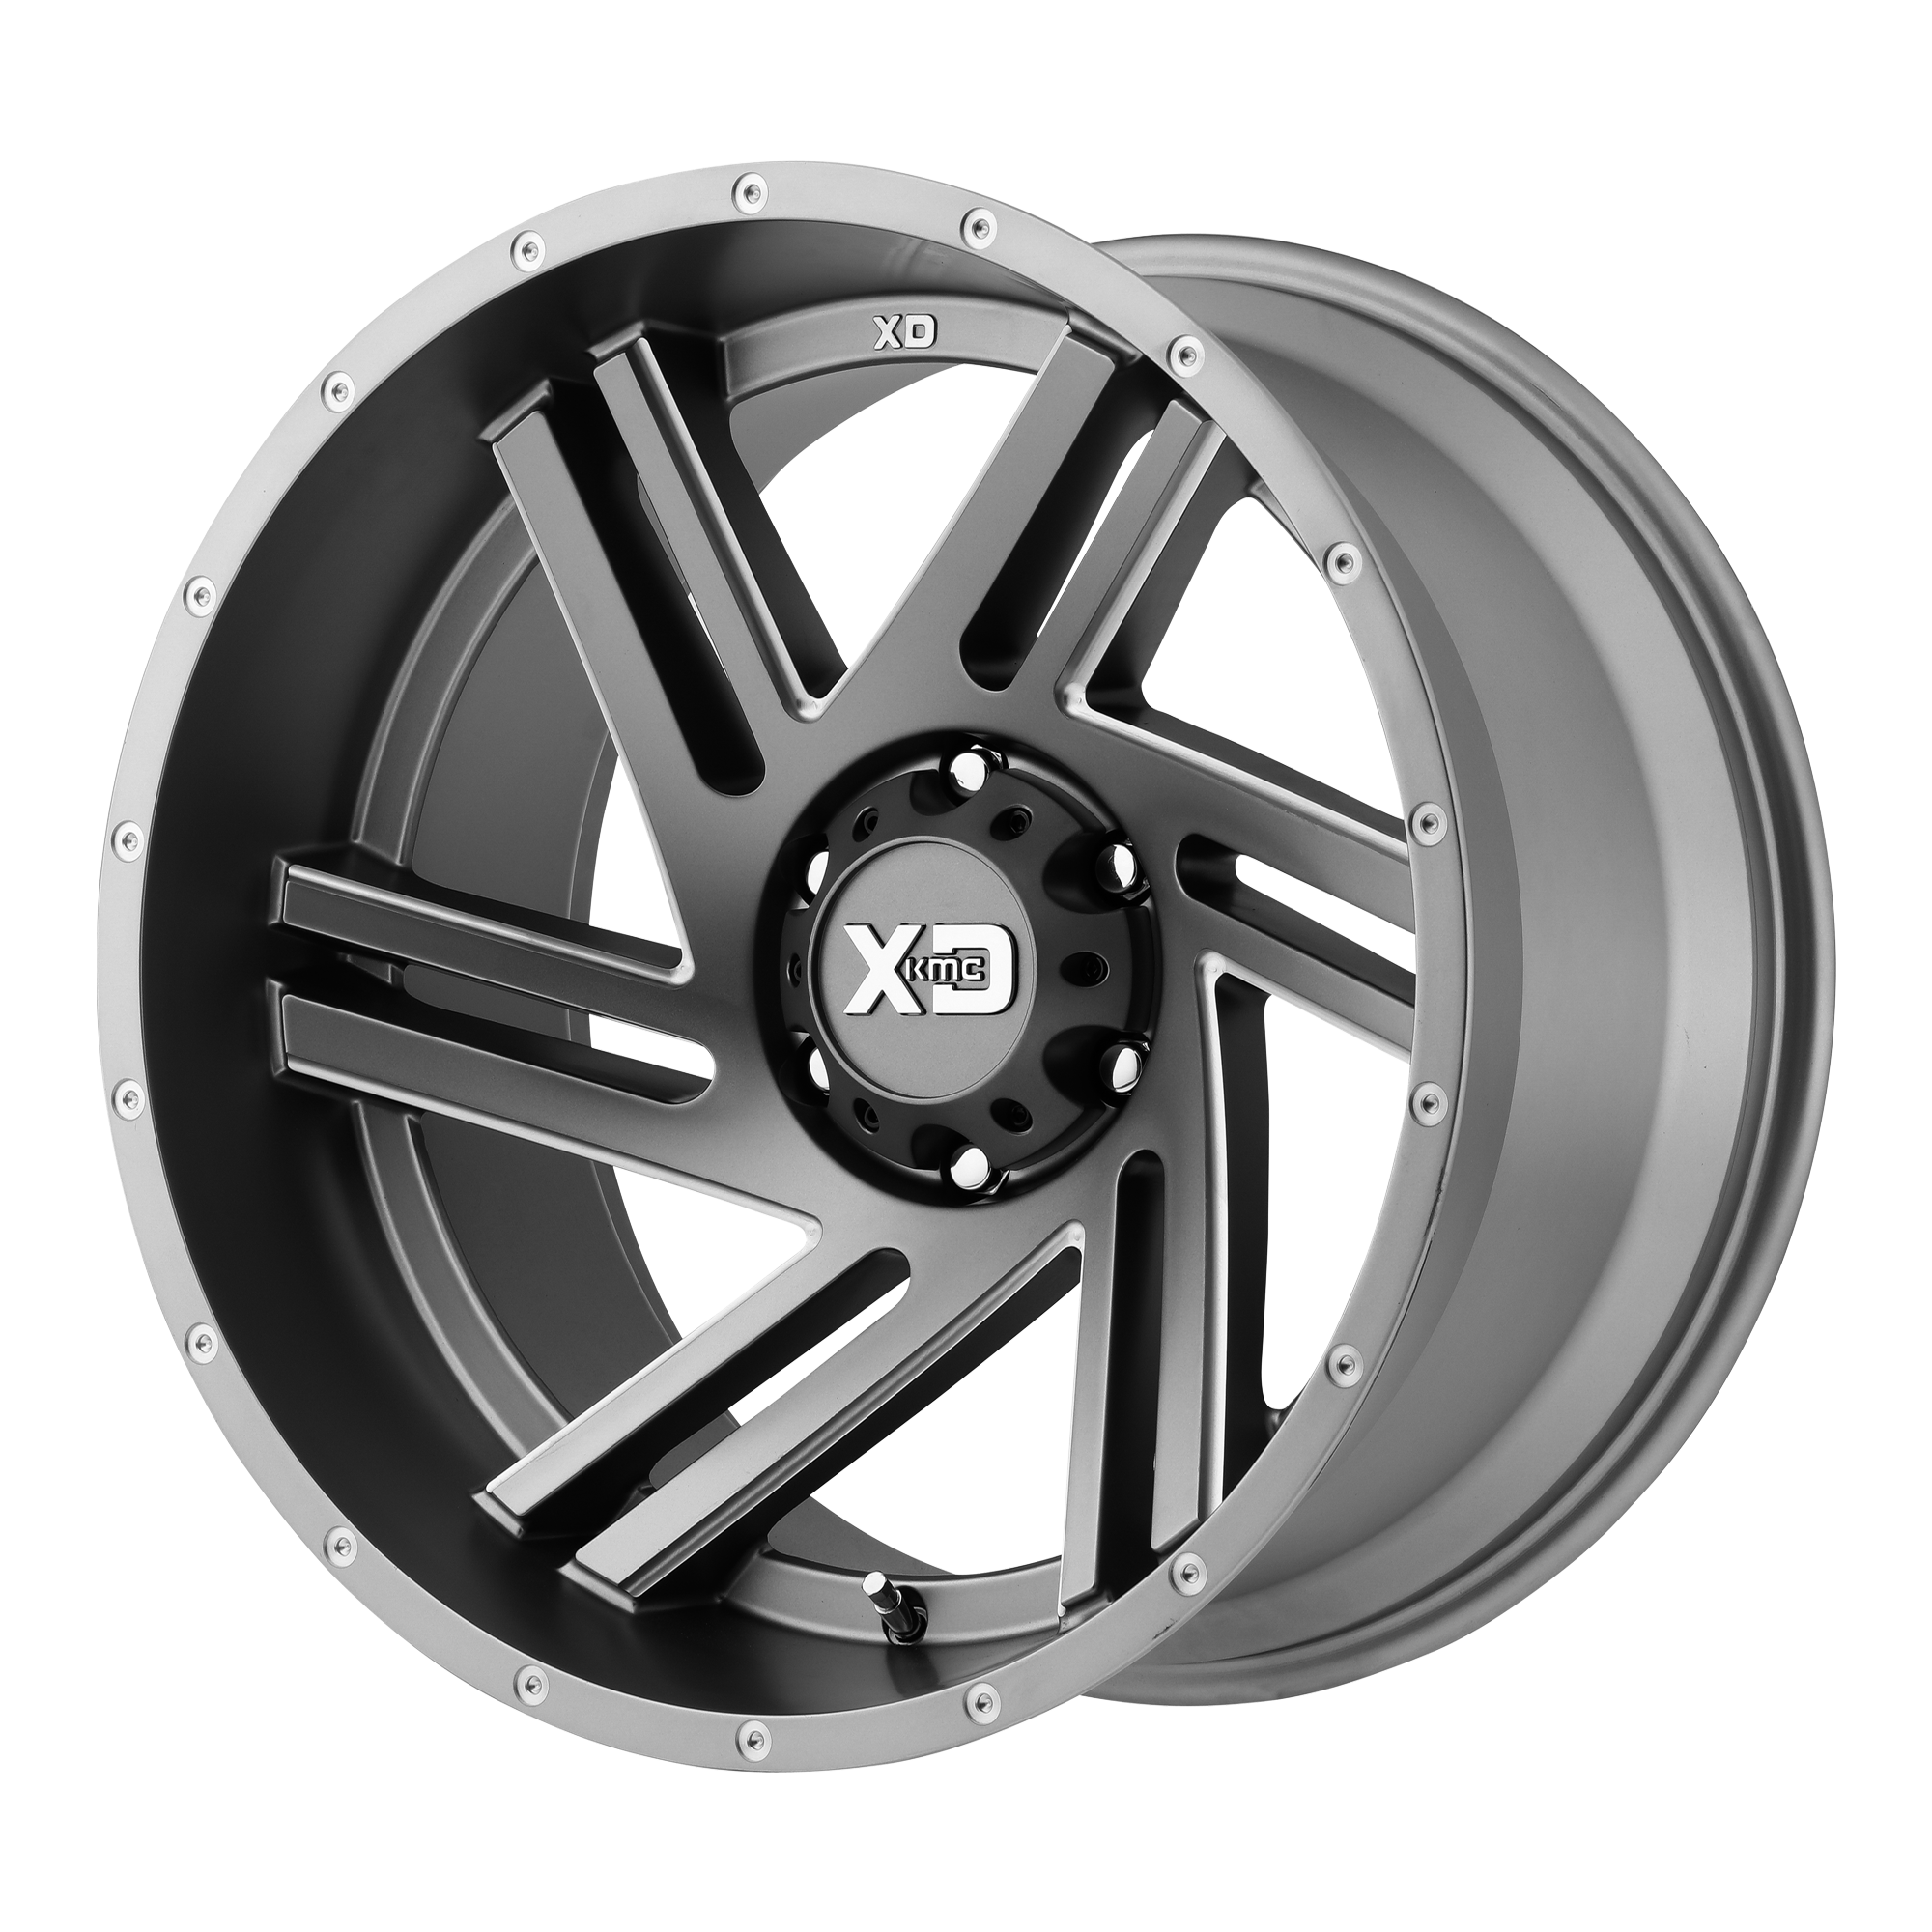 XD SERIES XD835 SWIPE hliníkové disky 9x17 6x139,7 ET30 Satin Gray Milled